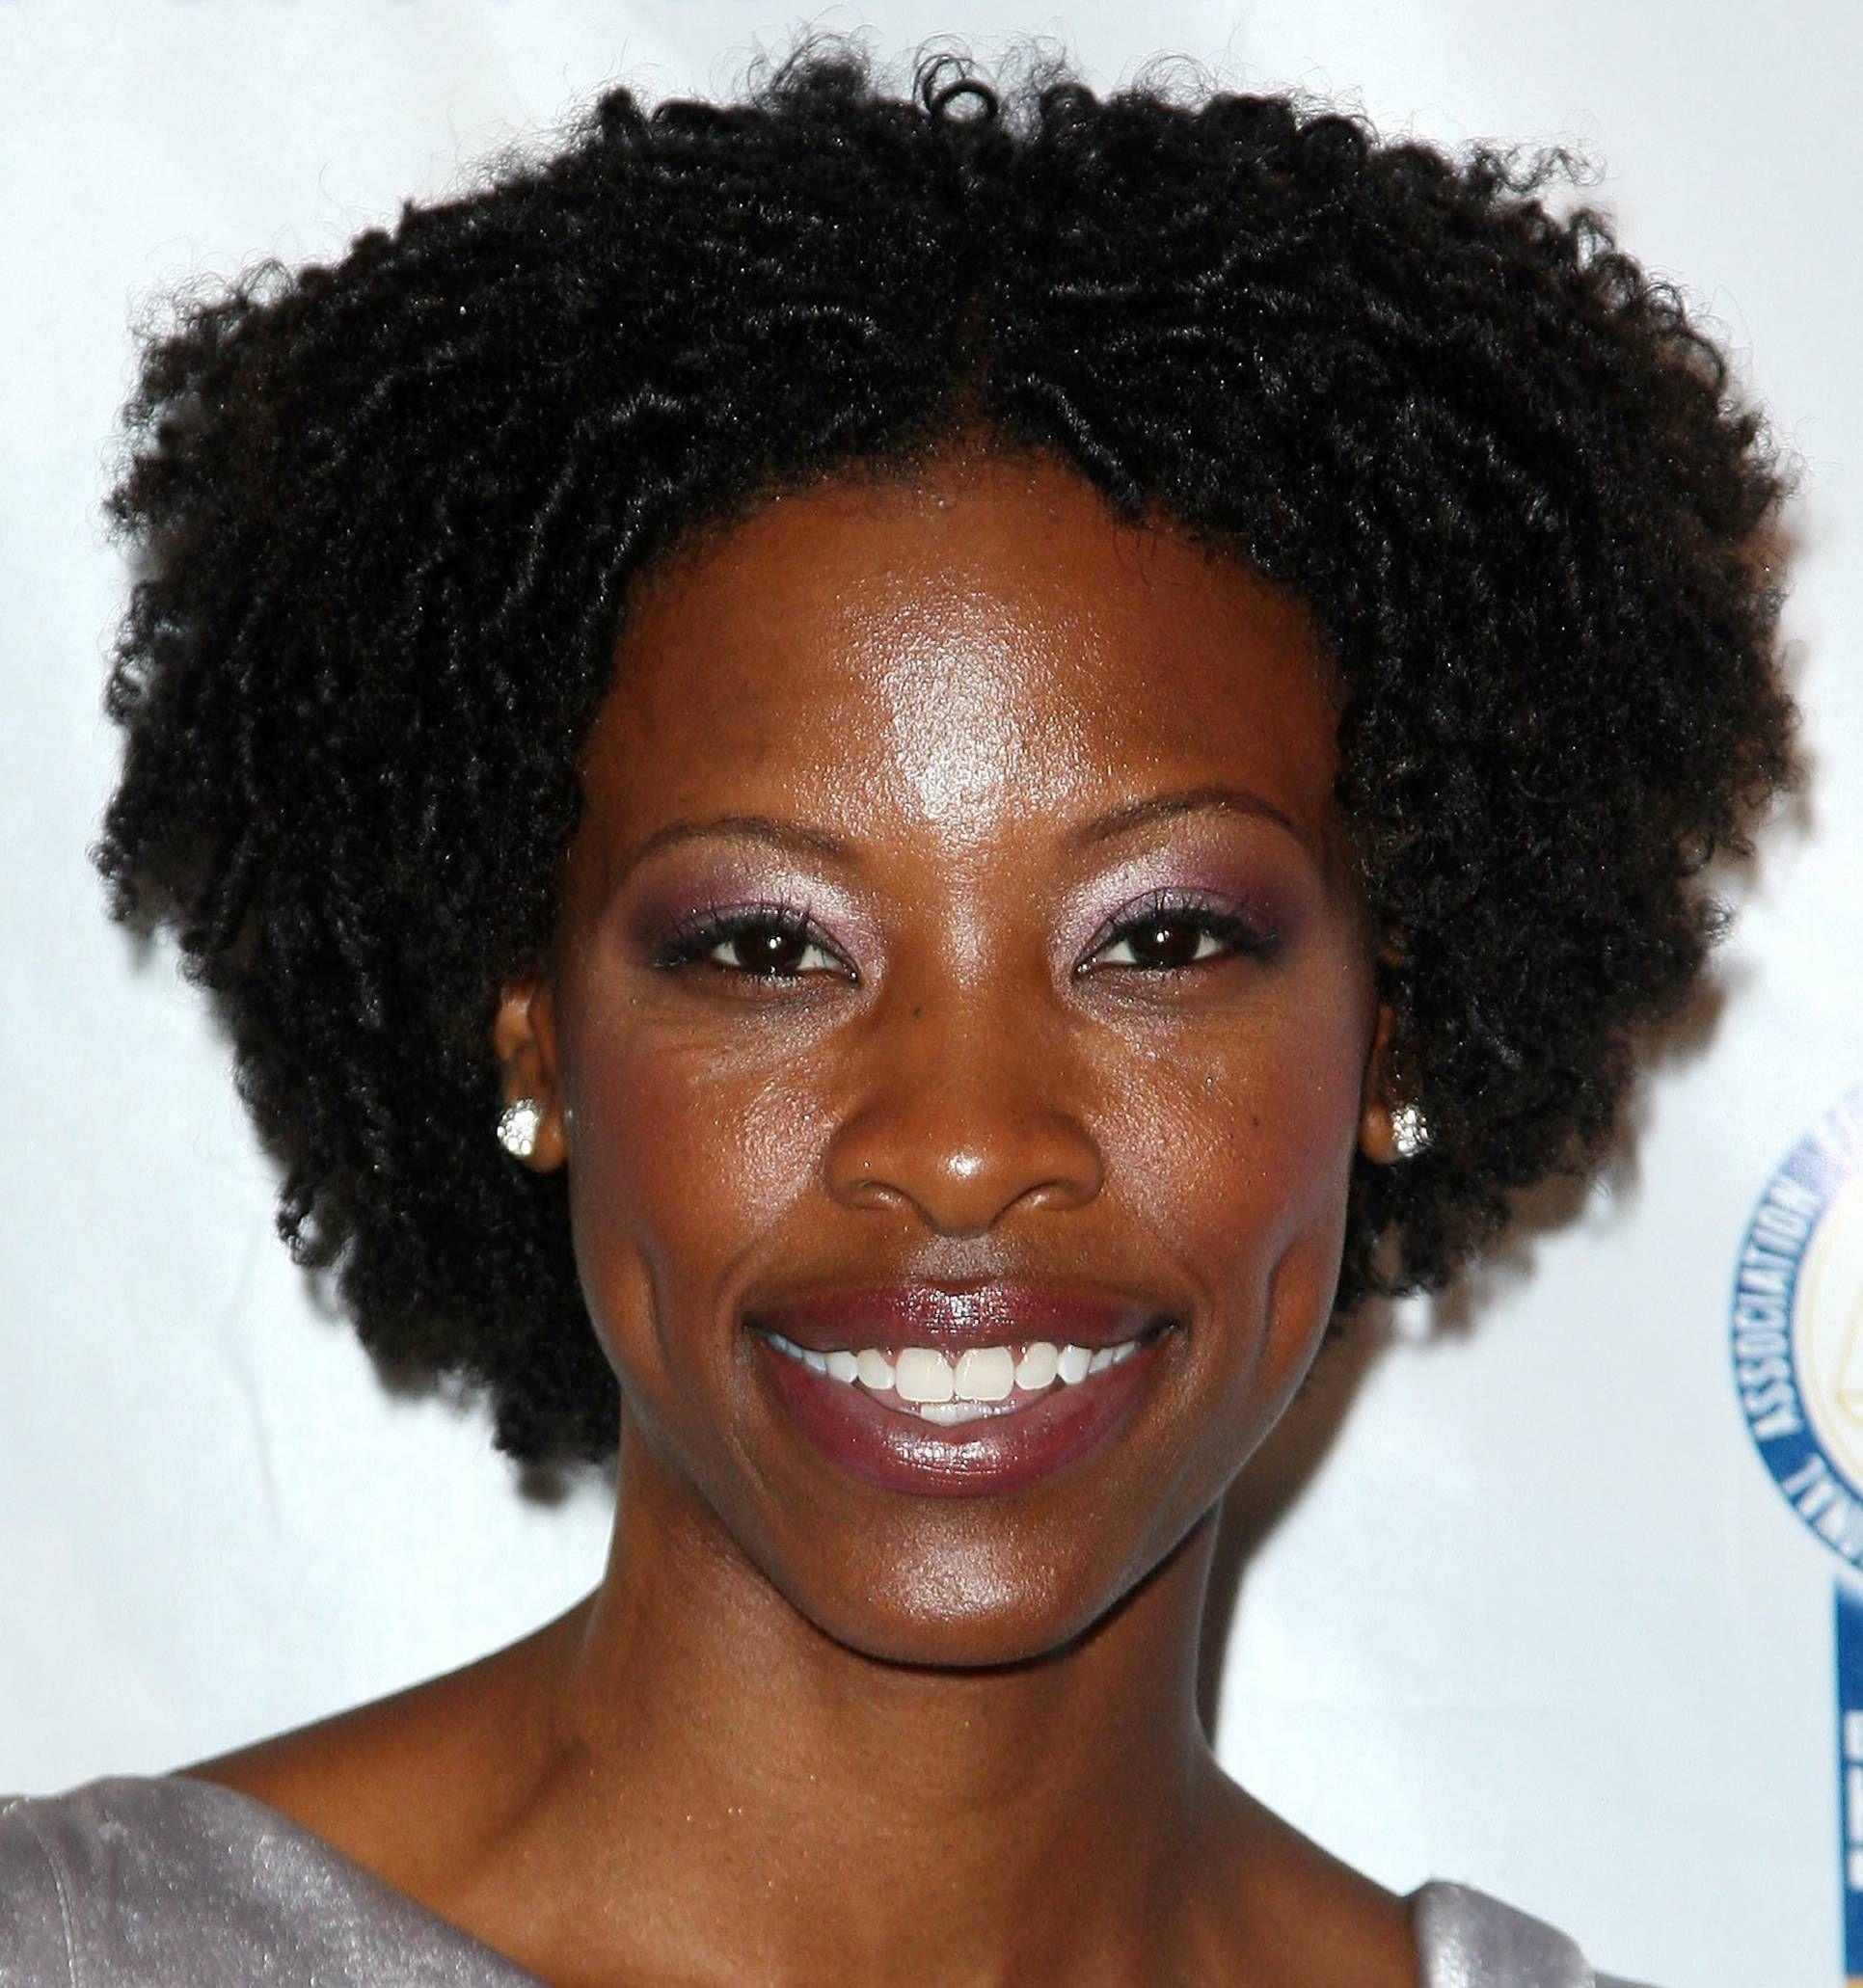 Astounding 80S Black Hairstyles Pictures Finest Pictures Gallery Short Hairstyles For Black Women Fulllsitofus